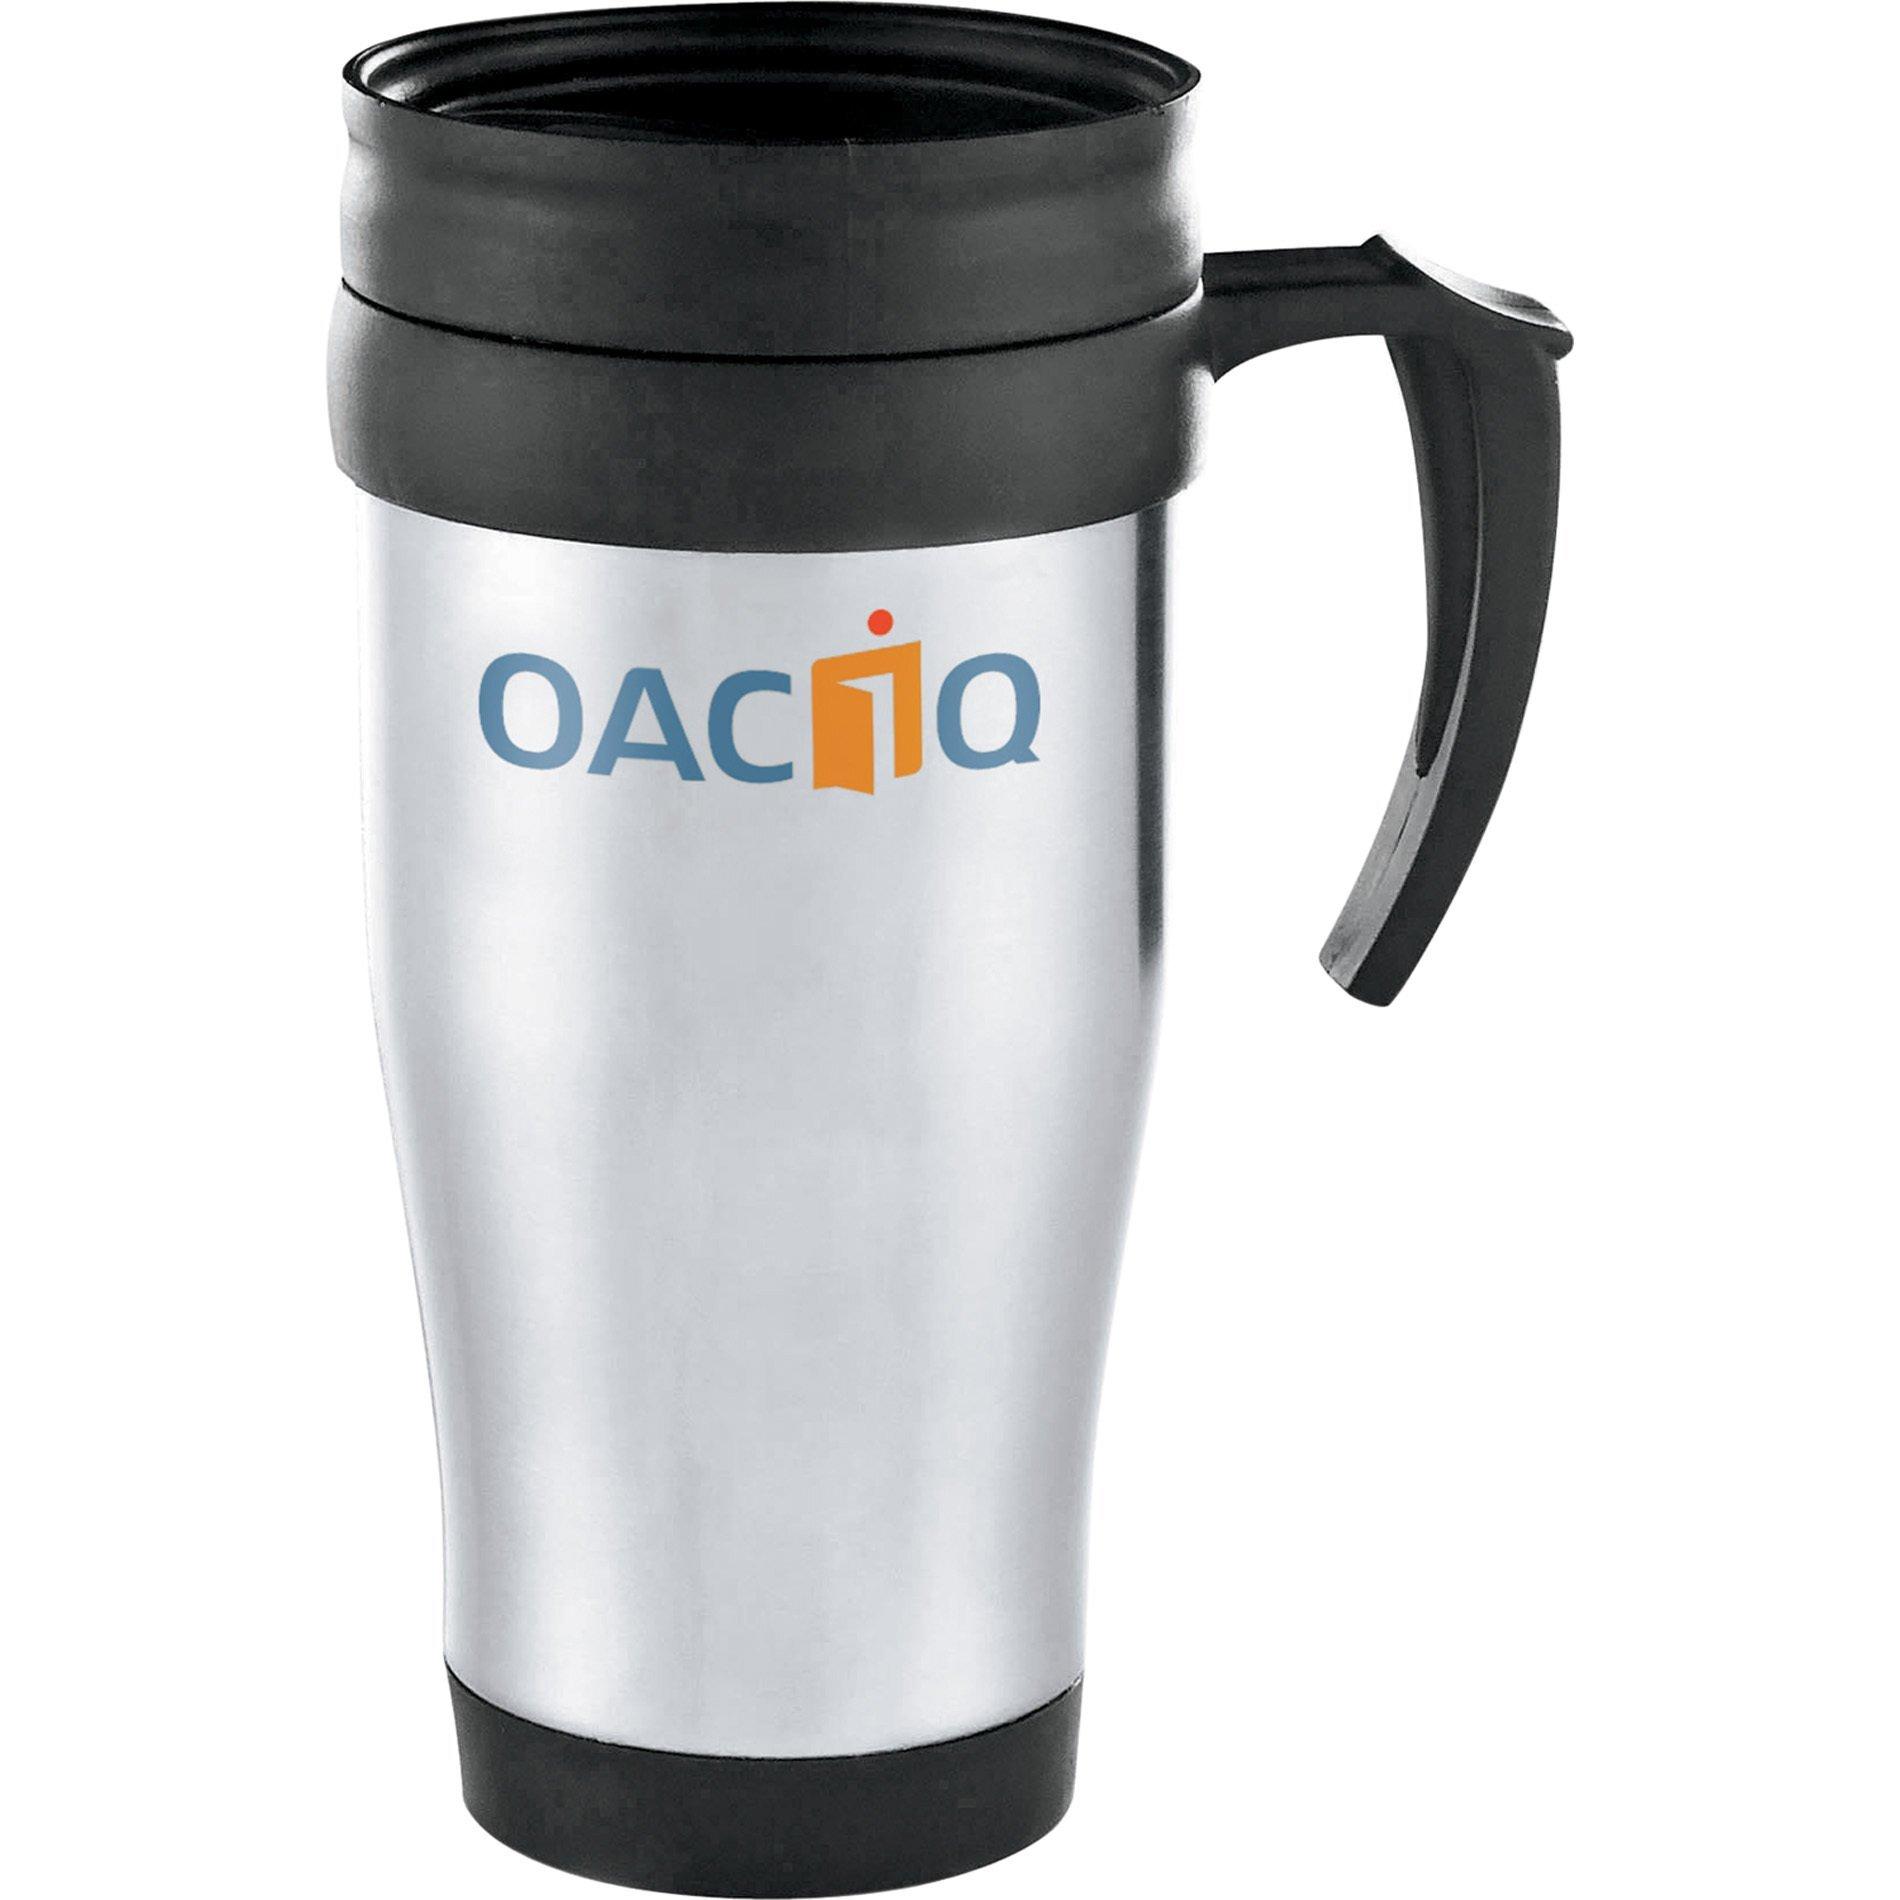 Java Stainless Travel Mug, 14oz.